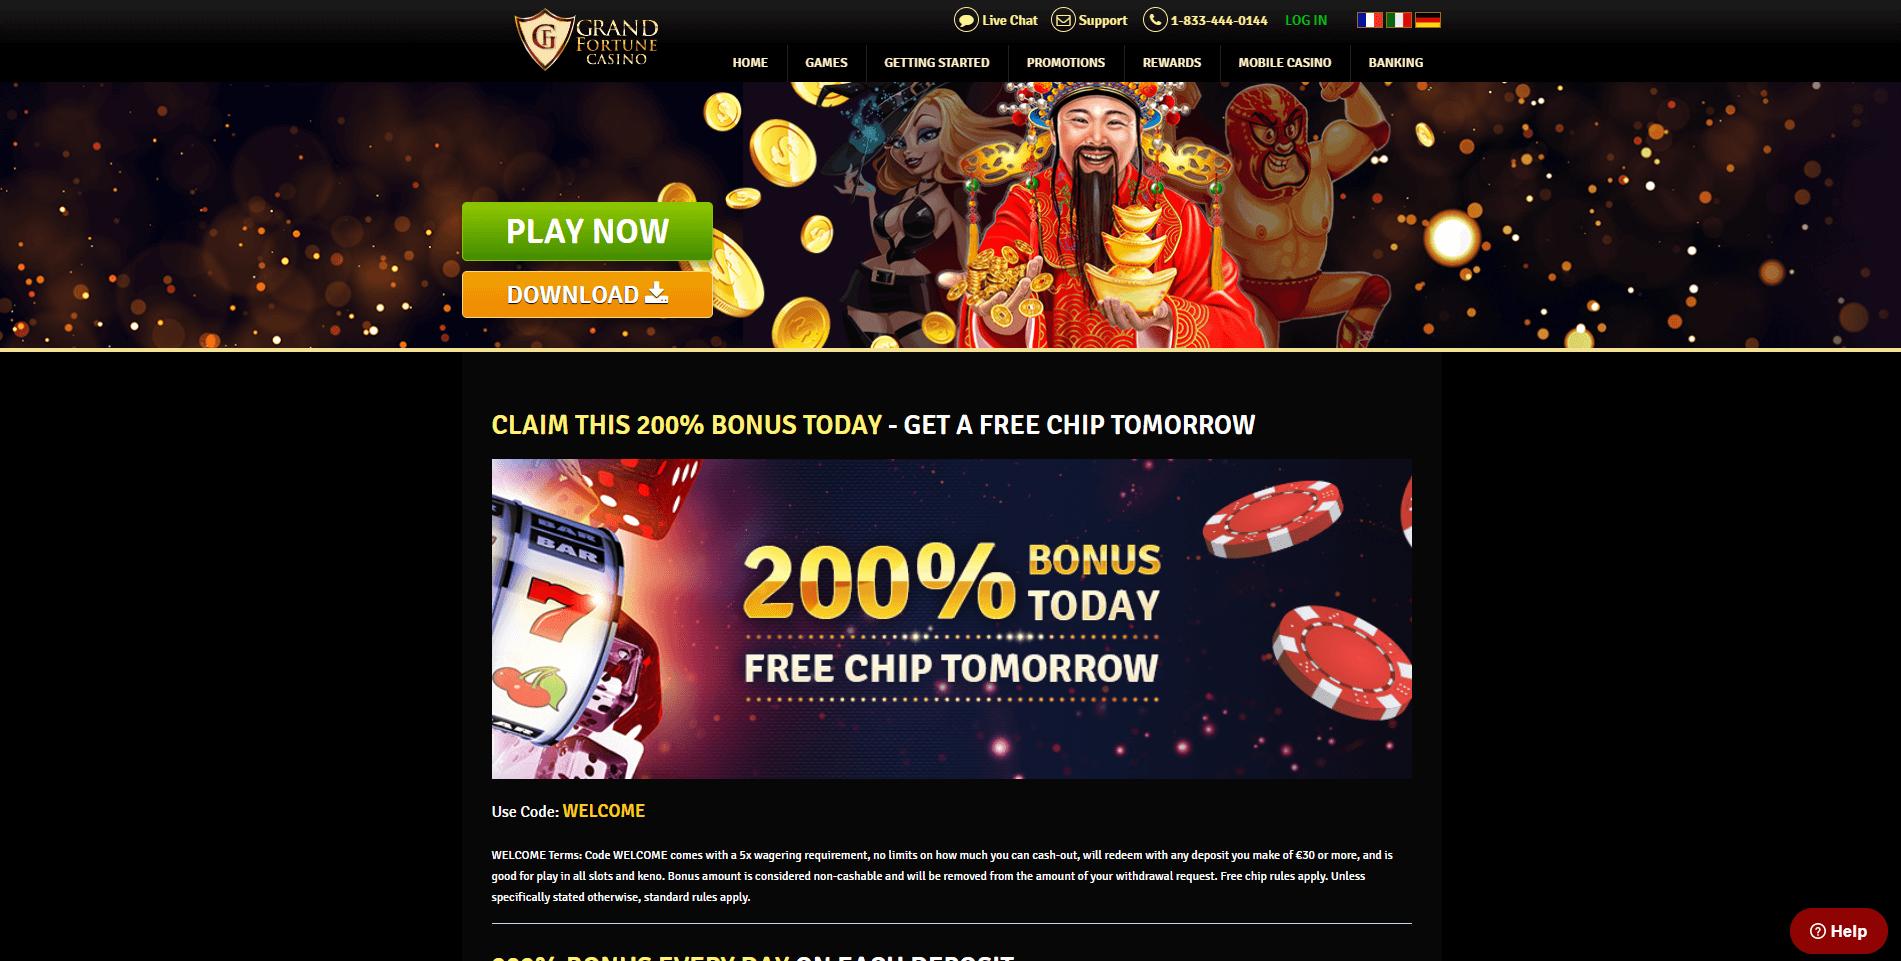 Grand Fortune Casino Free Spins Bonus 2020 Yummyspins